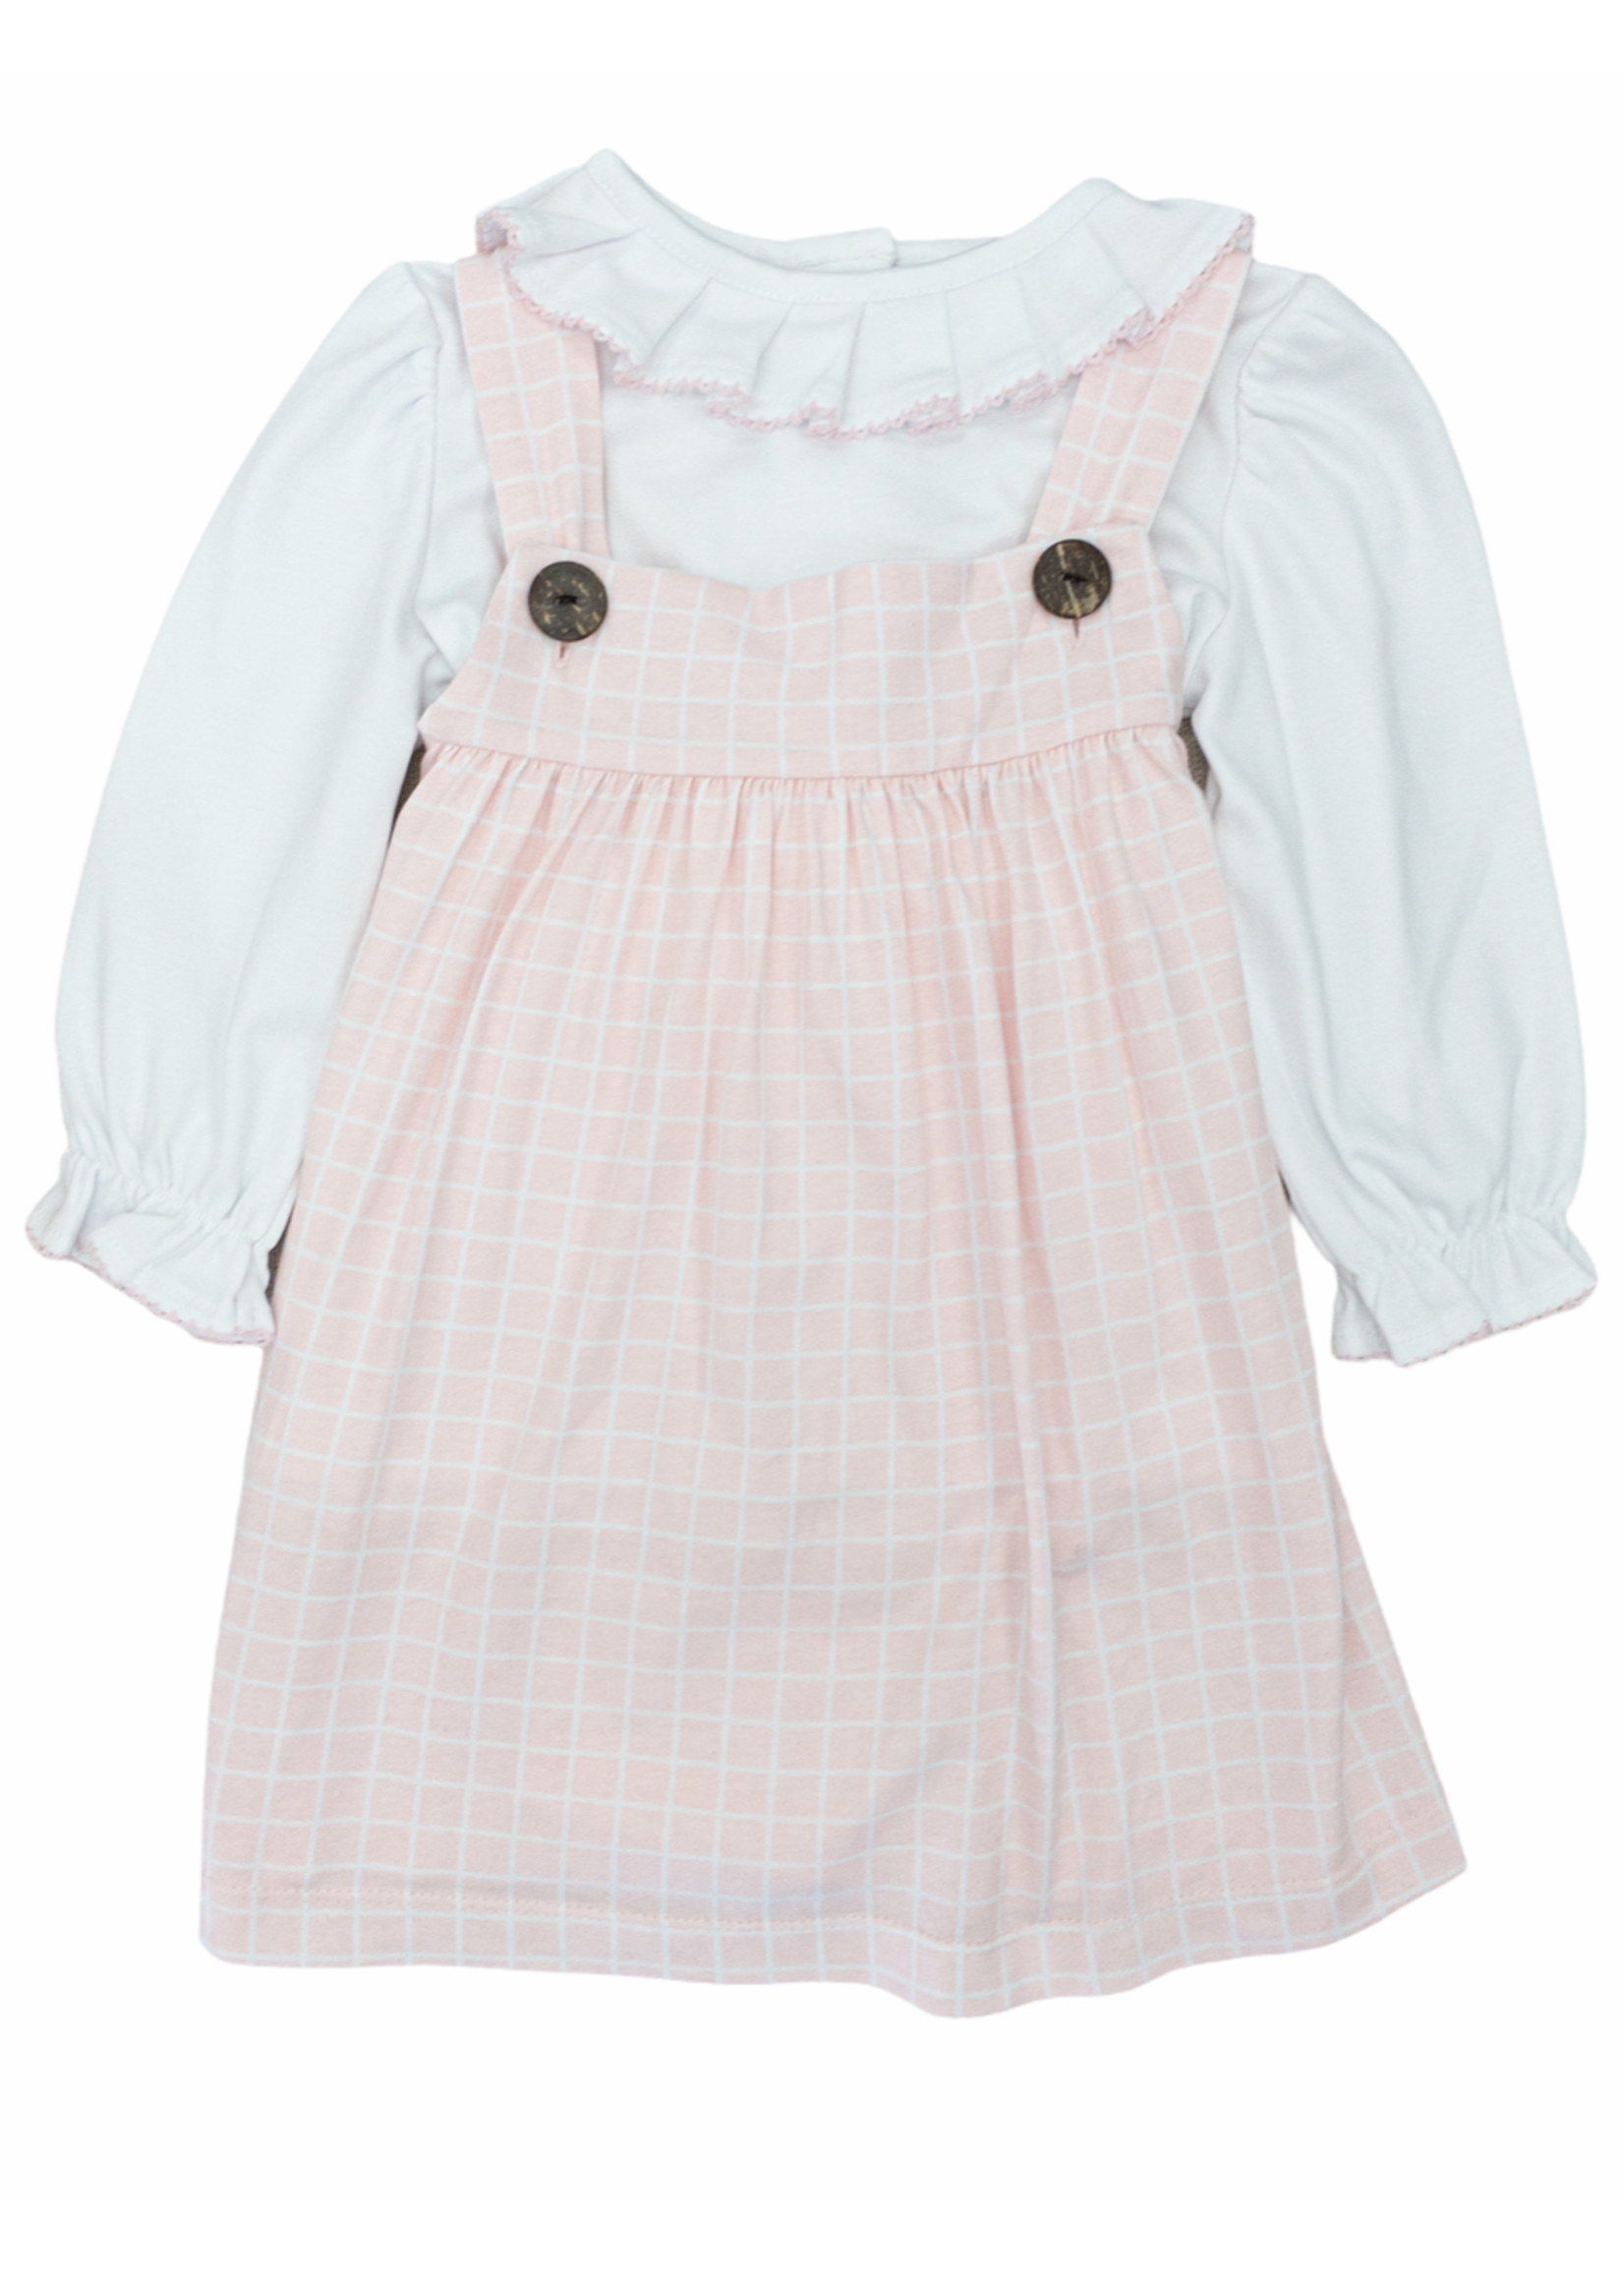 True Pleated Collar Dress set